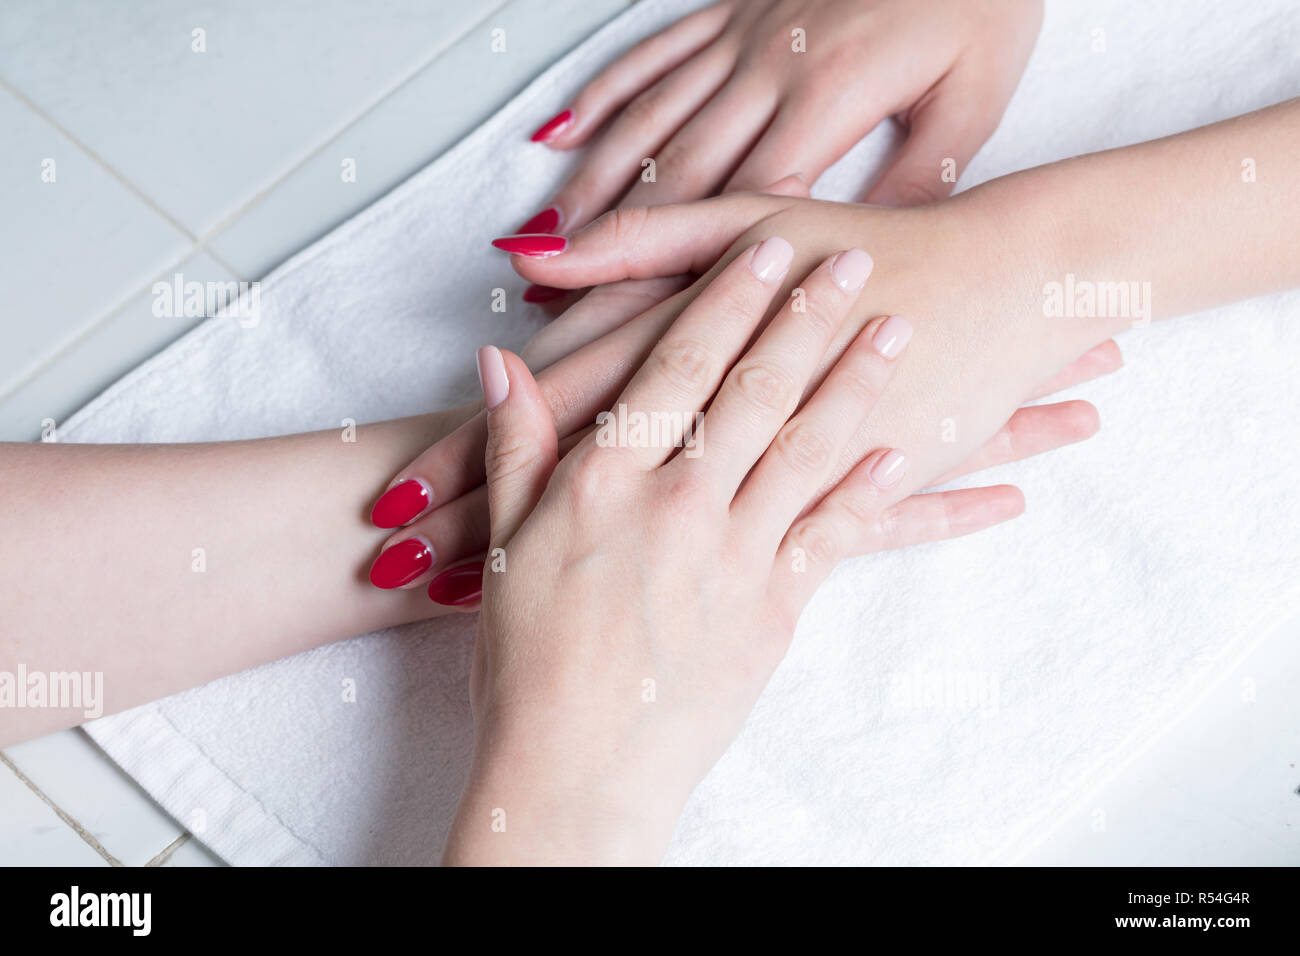 Close up of a hand massage - Stock Image